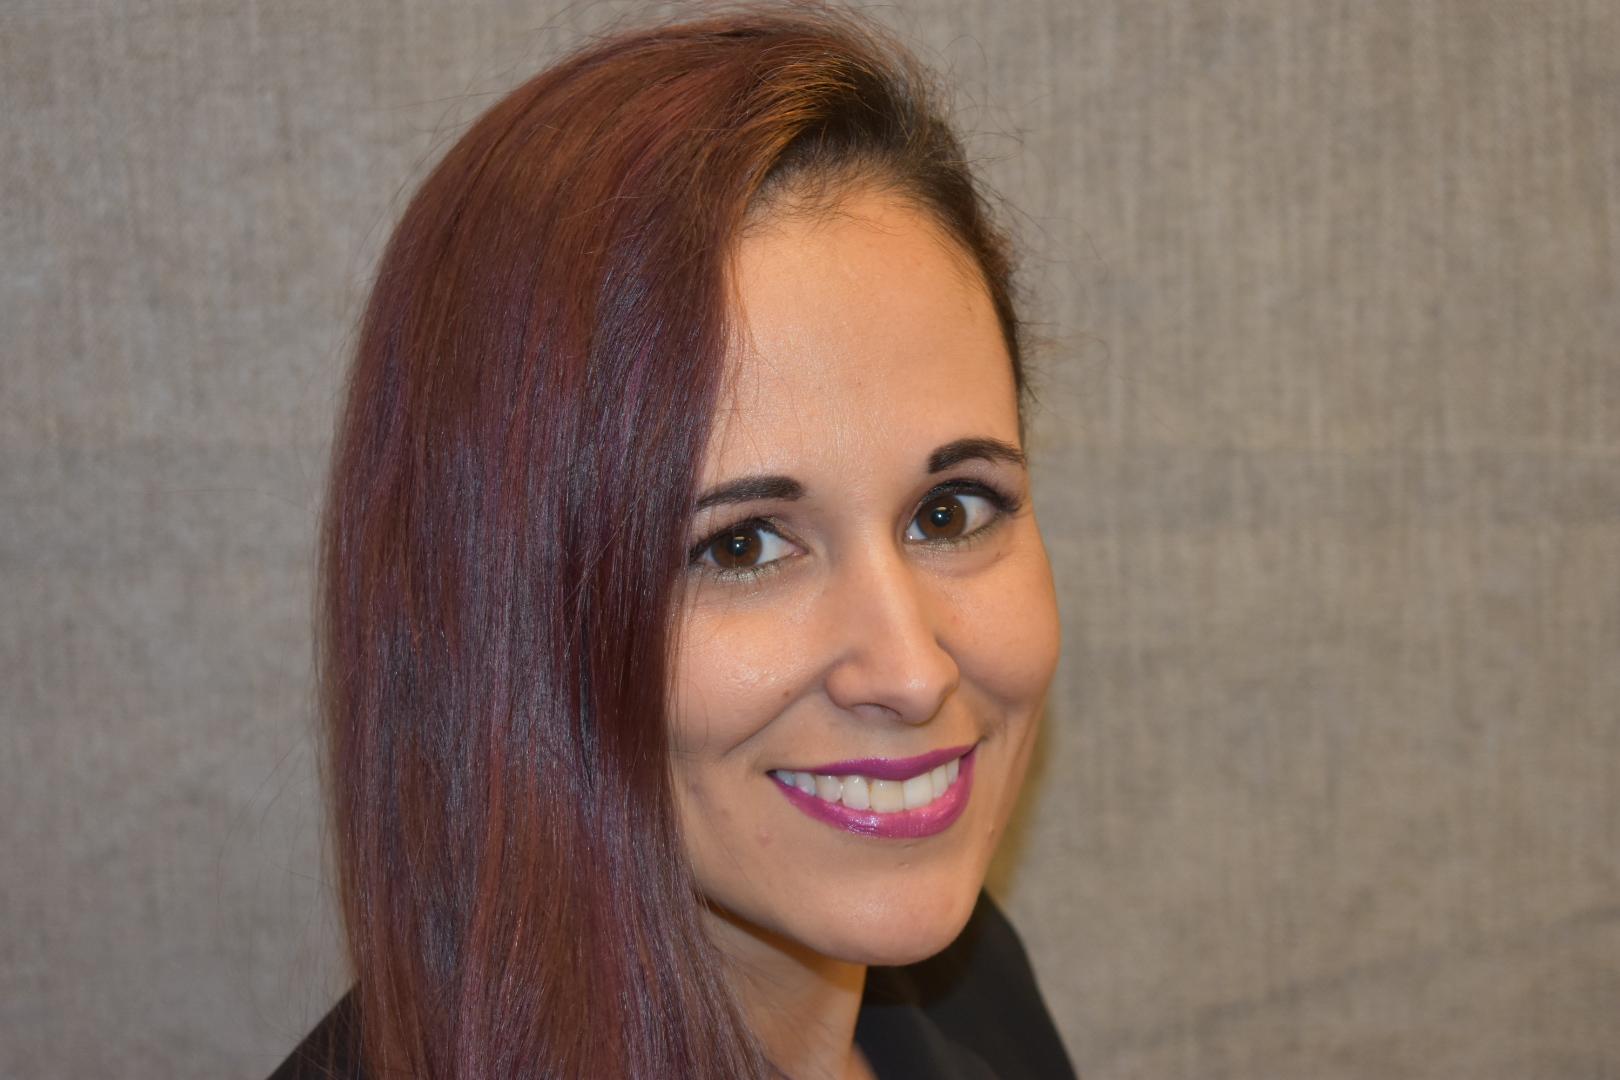 DeAnna Sossaman Dental Implants